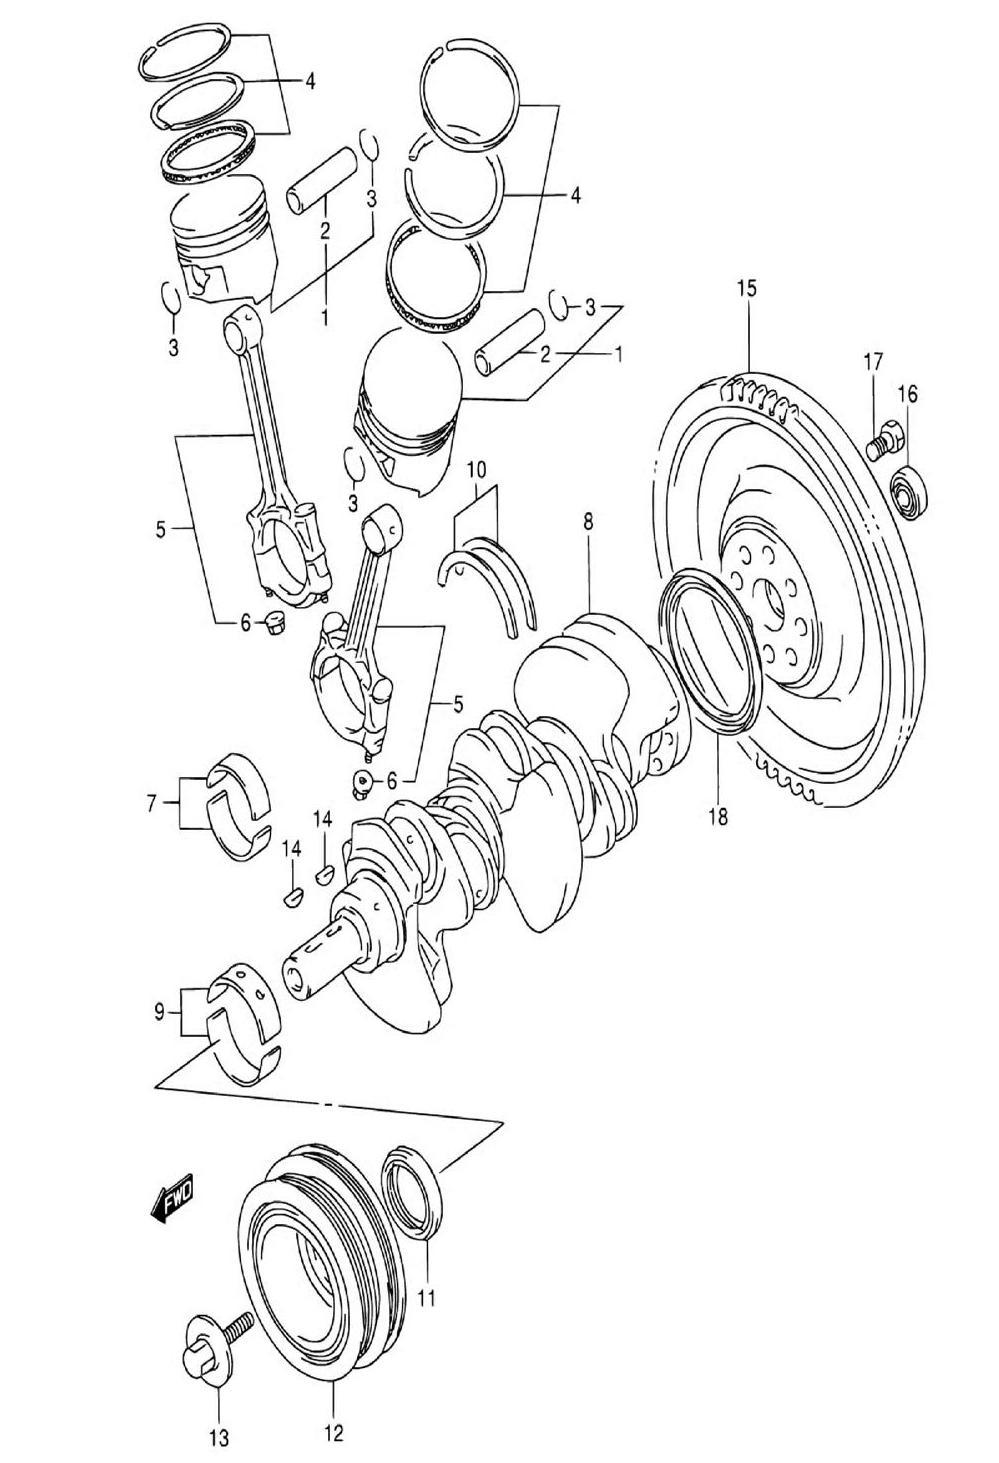 https://wiringdiagram.herokuapp.com/post/suzuki-grand-vitara-sq416 Bissell Proheat X Schematic Diagram Model on